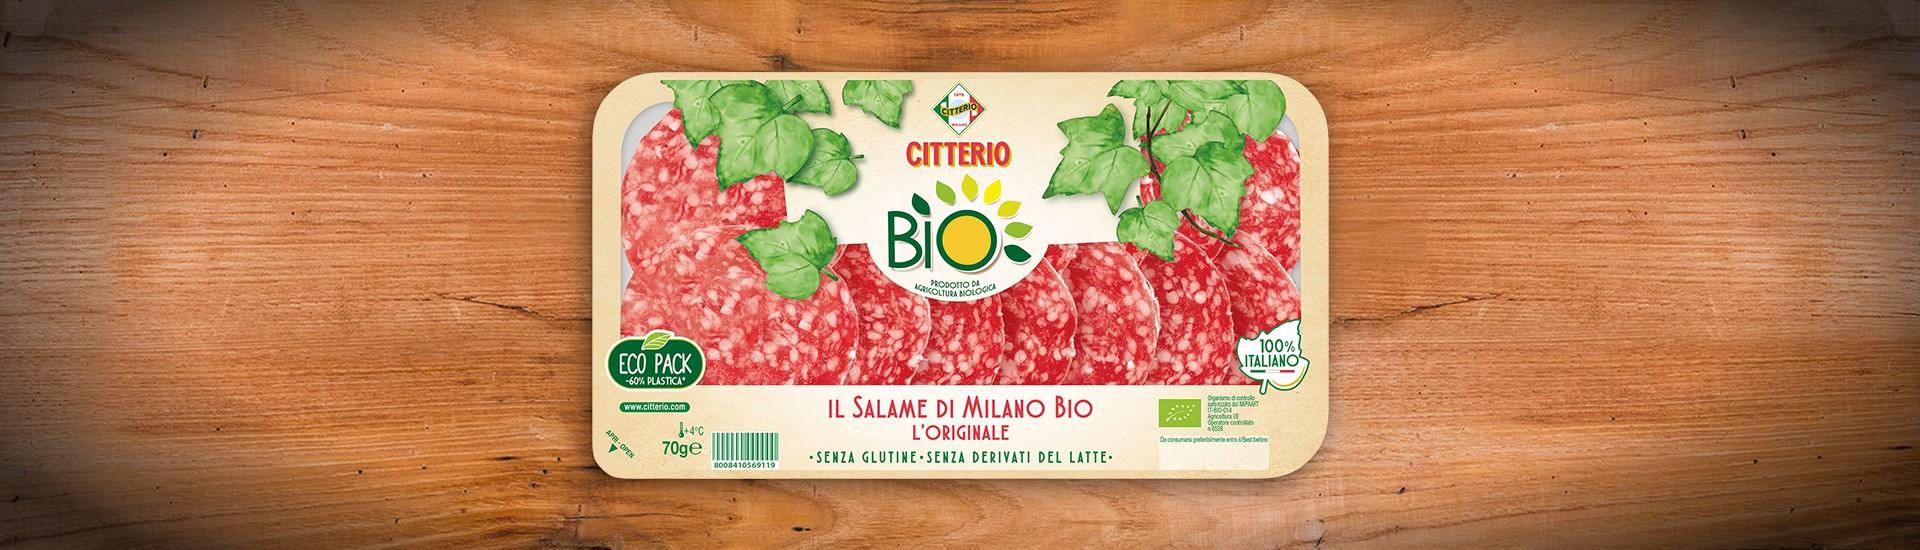 Salame Bio